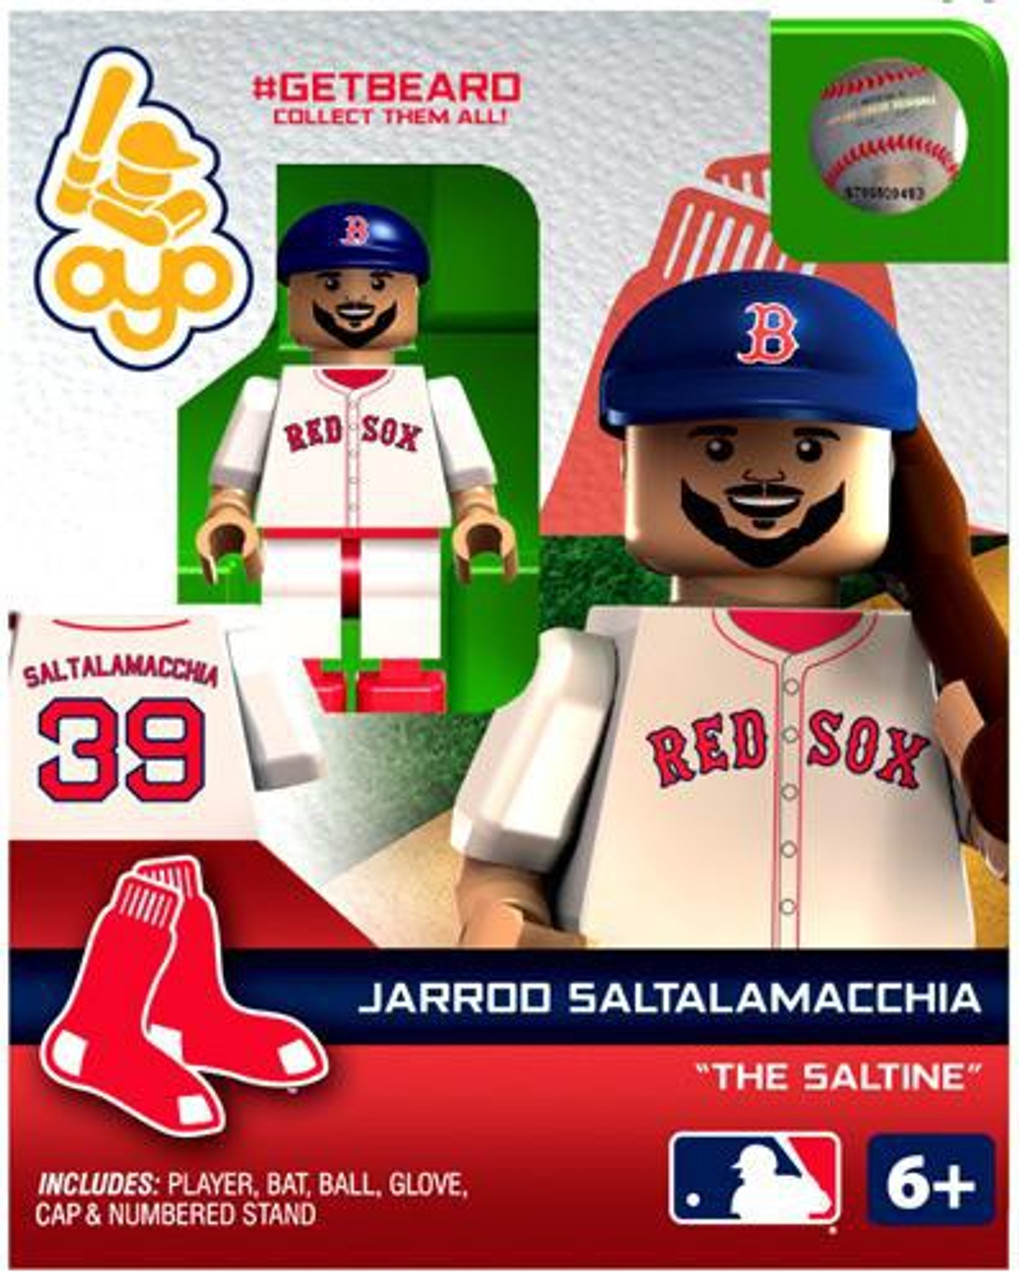 Boston Red Sox MLB Getbeard Jarrod Saltalamacchia Minifigure GETBEARD [The Saltine]